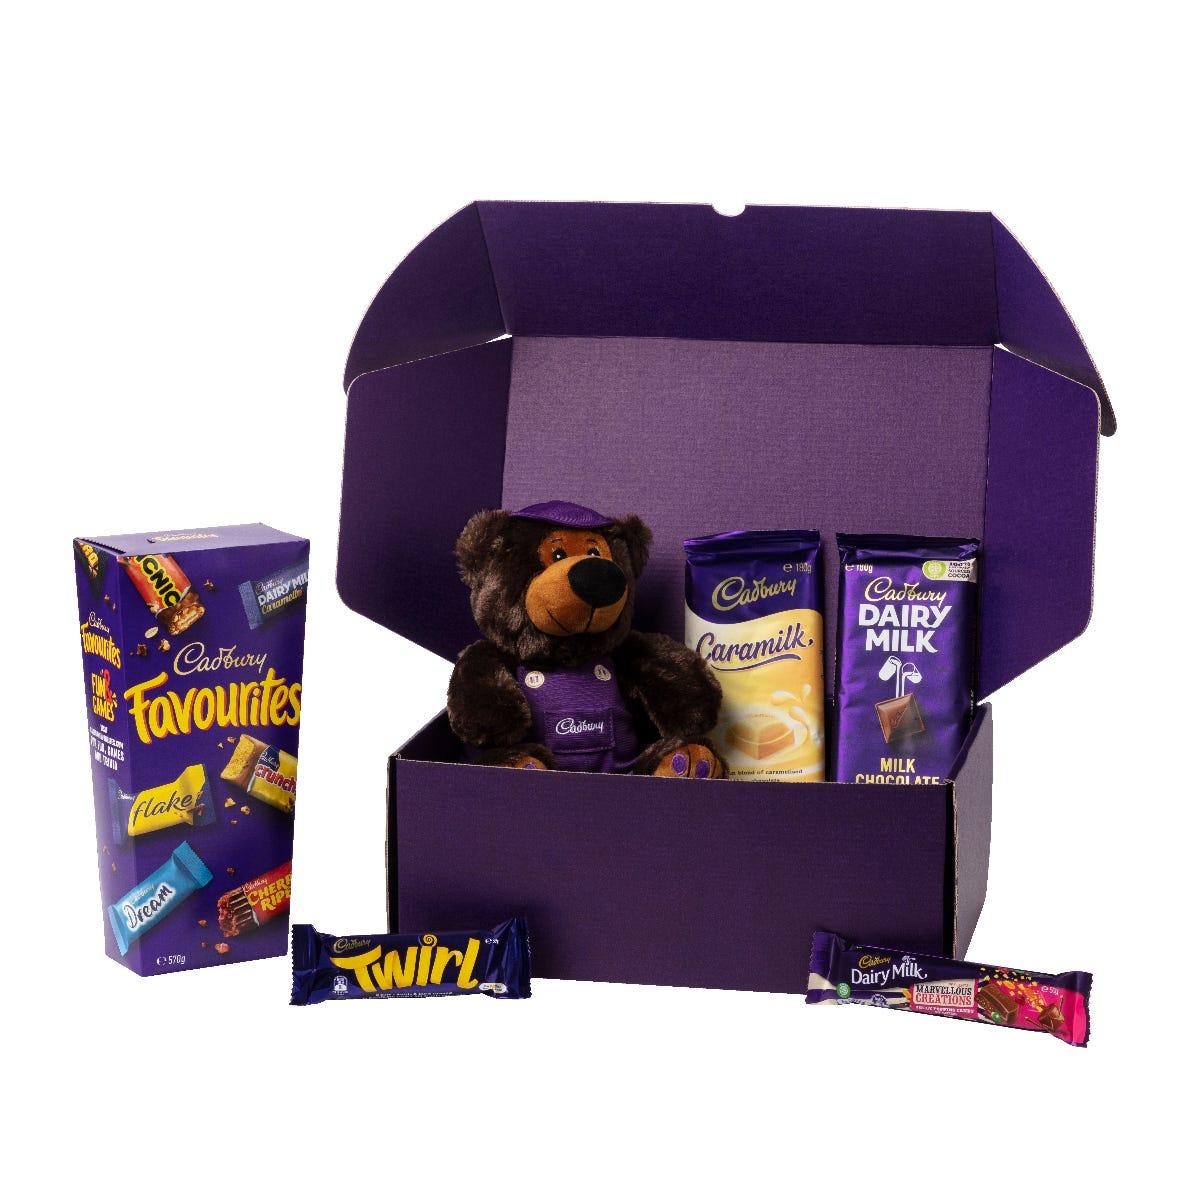 Cadbury Favourites Hamper with Bear